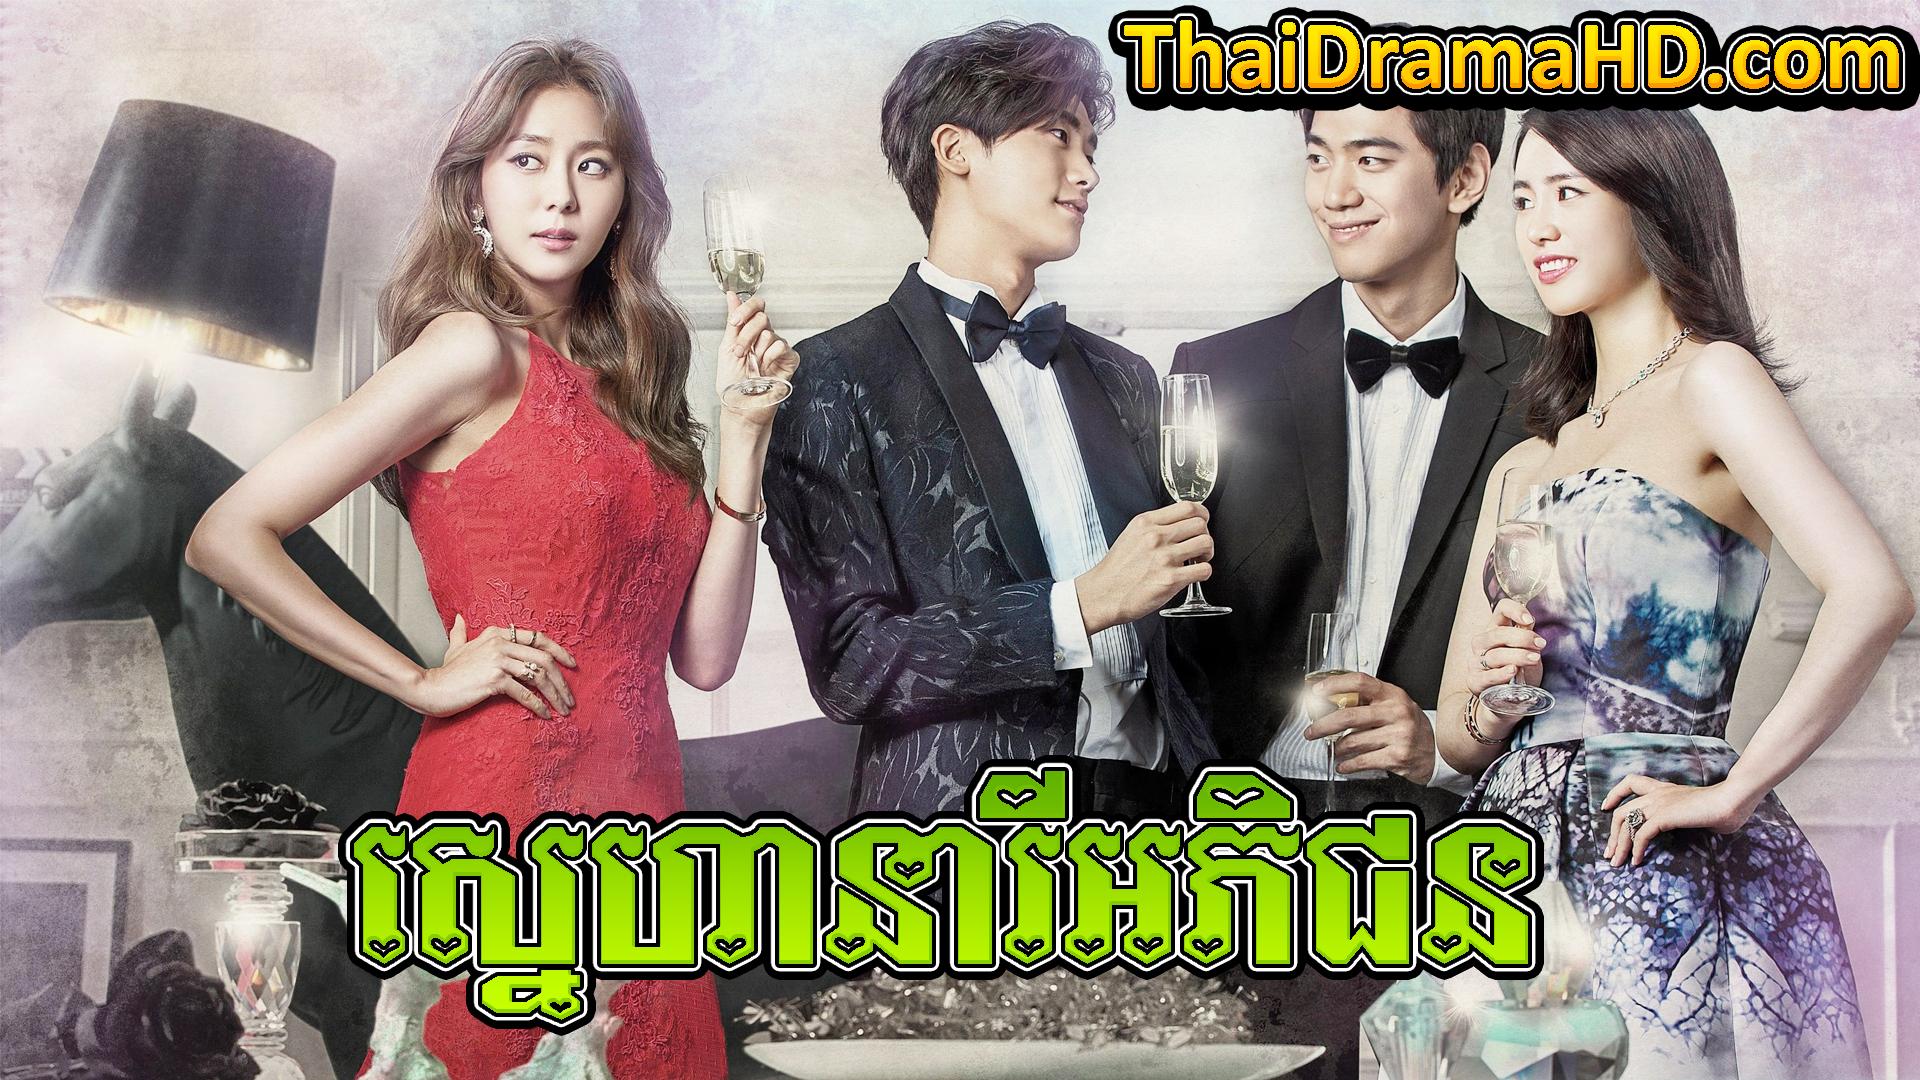 Sneha Neary Aphichun | Thai Drama | Khmer Movie | Phumikhmer | movie-khmer | video4khmer | khmotions | kolabkhmer | khmer drama | ksdrama | cookingtips | roscheat | khmertimeskh | khmerkomsan | phumi7 | merlkon | film2us | movie2kh | sweetdrama | khmercitylove | khreplay | tvb cambodia drama | ckh7 | srokthai | phumimedia | phumi8 | khmer avenue | khmer search | Soyo | khmerfans